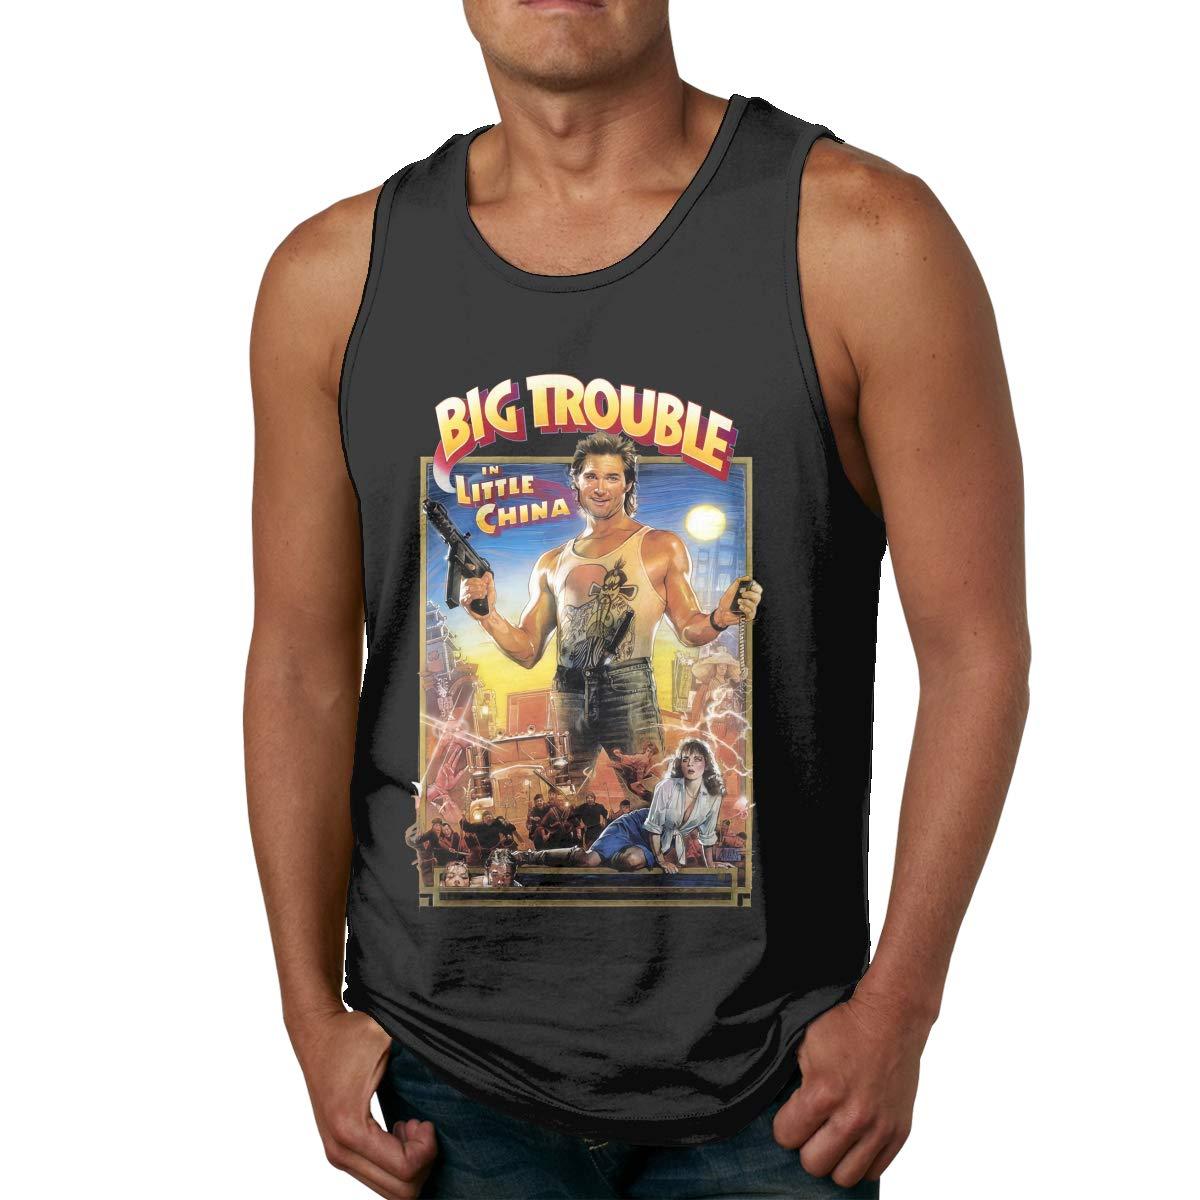 Zhejinij Big Trouble in Little China Mens Sleeveless Garment Tank Top Shirt Black